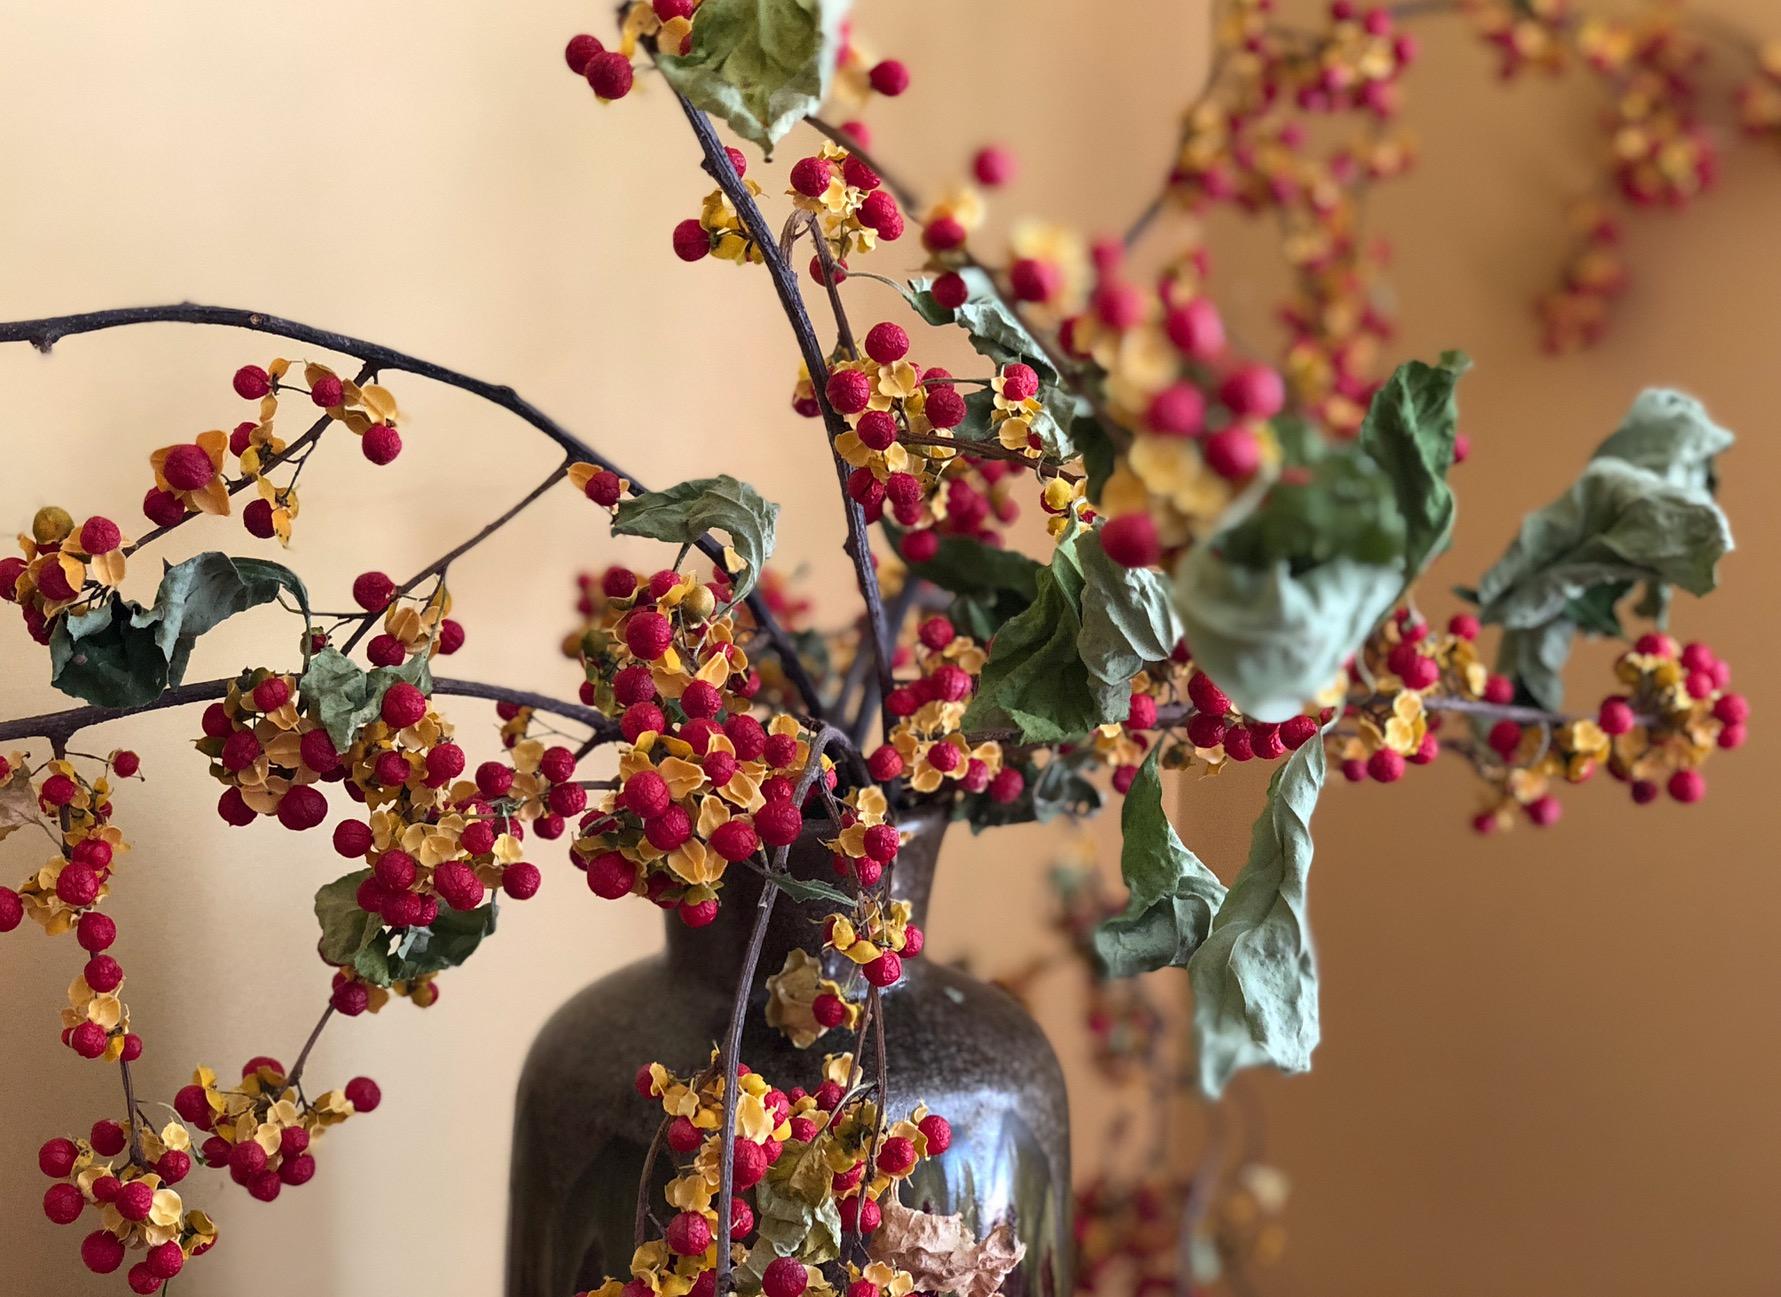 Winterberry arrangement, The Porches, North Adams, MA. ©2017seanwalmsley